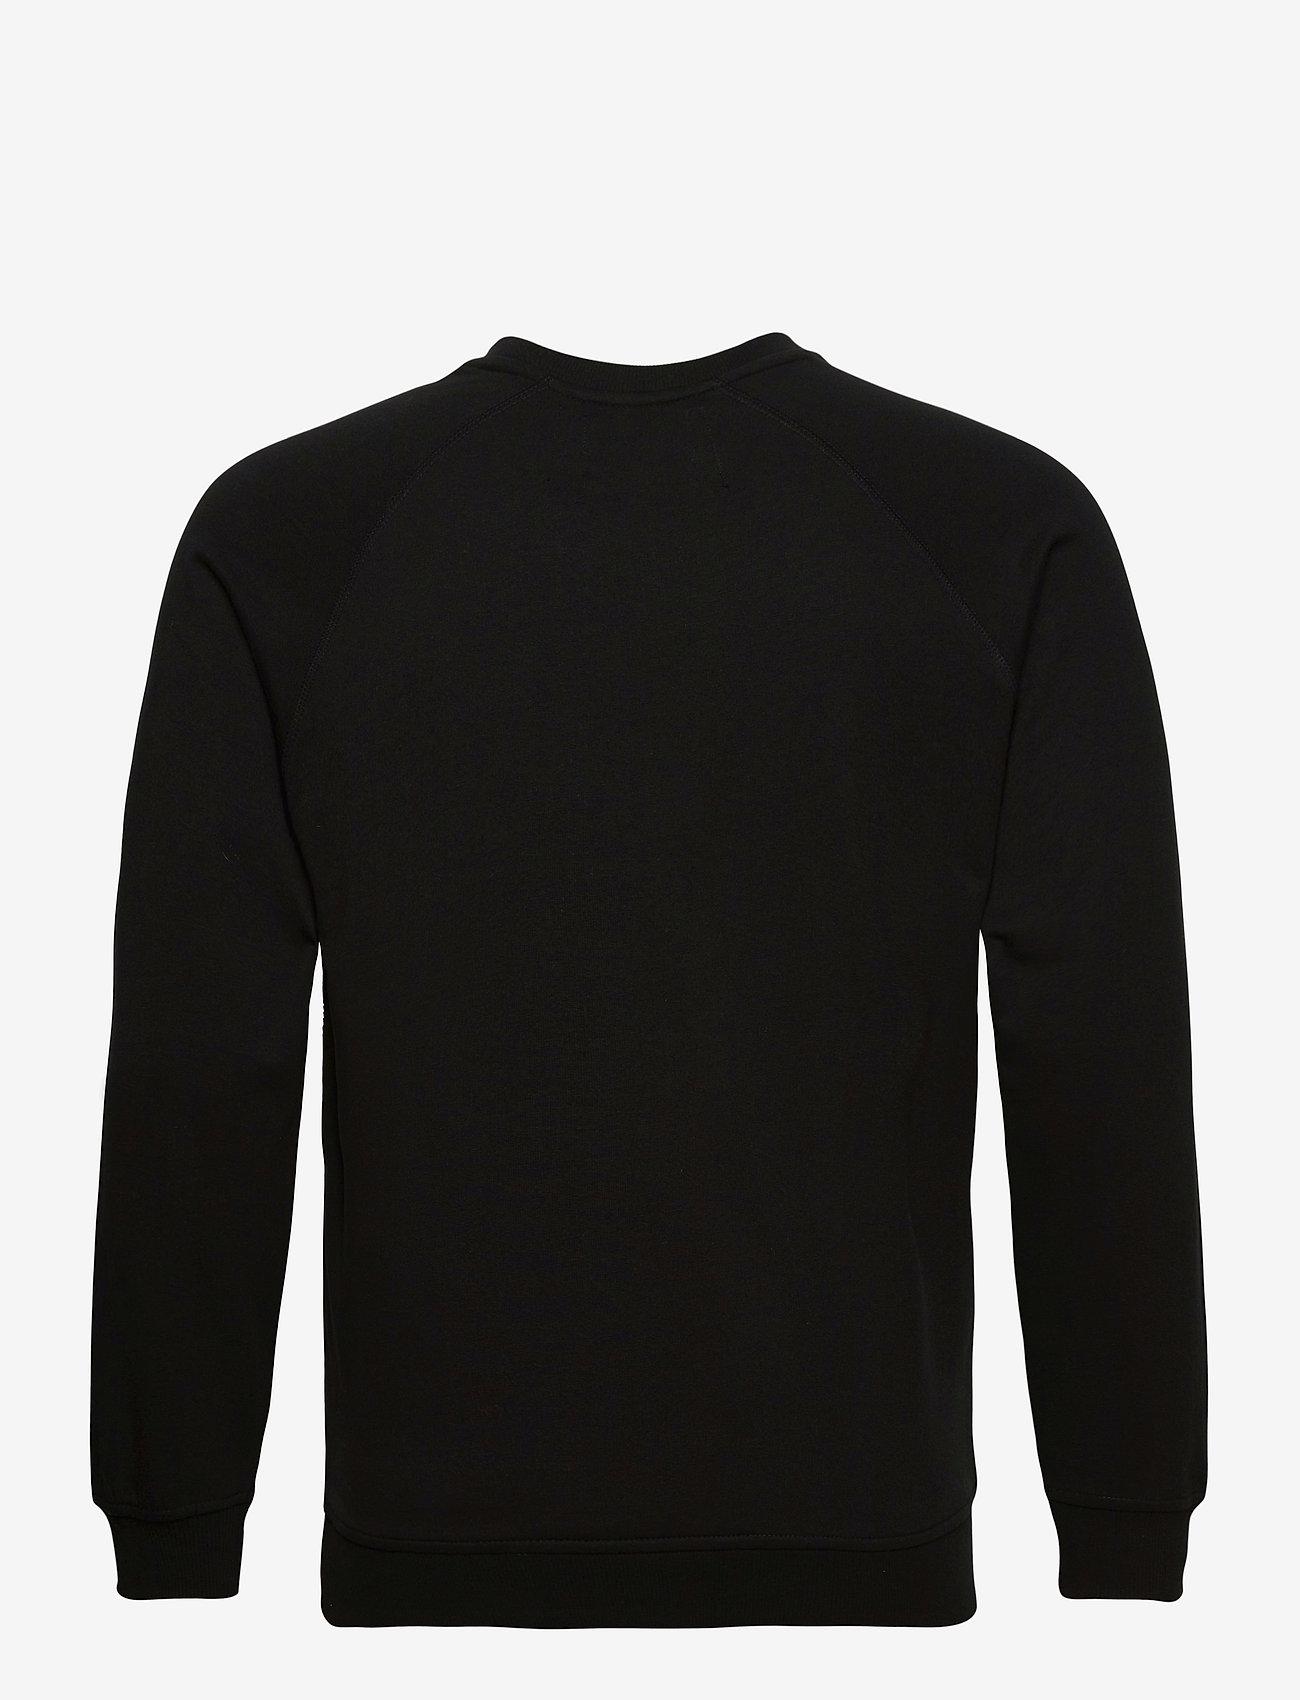 Denim project - BASIC SWEAT CREW - basic sweatshirts - 001 black - 1